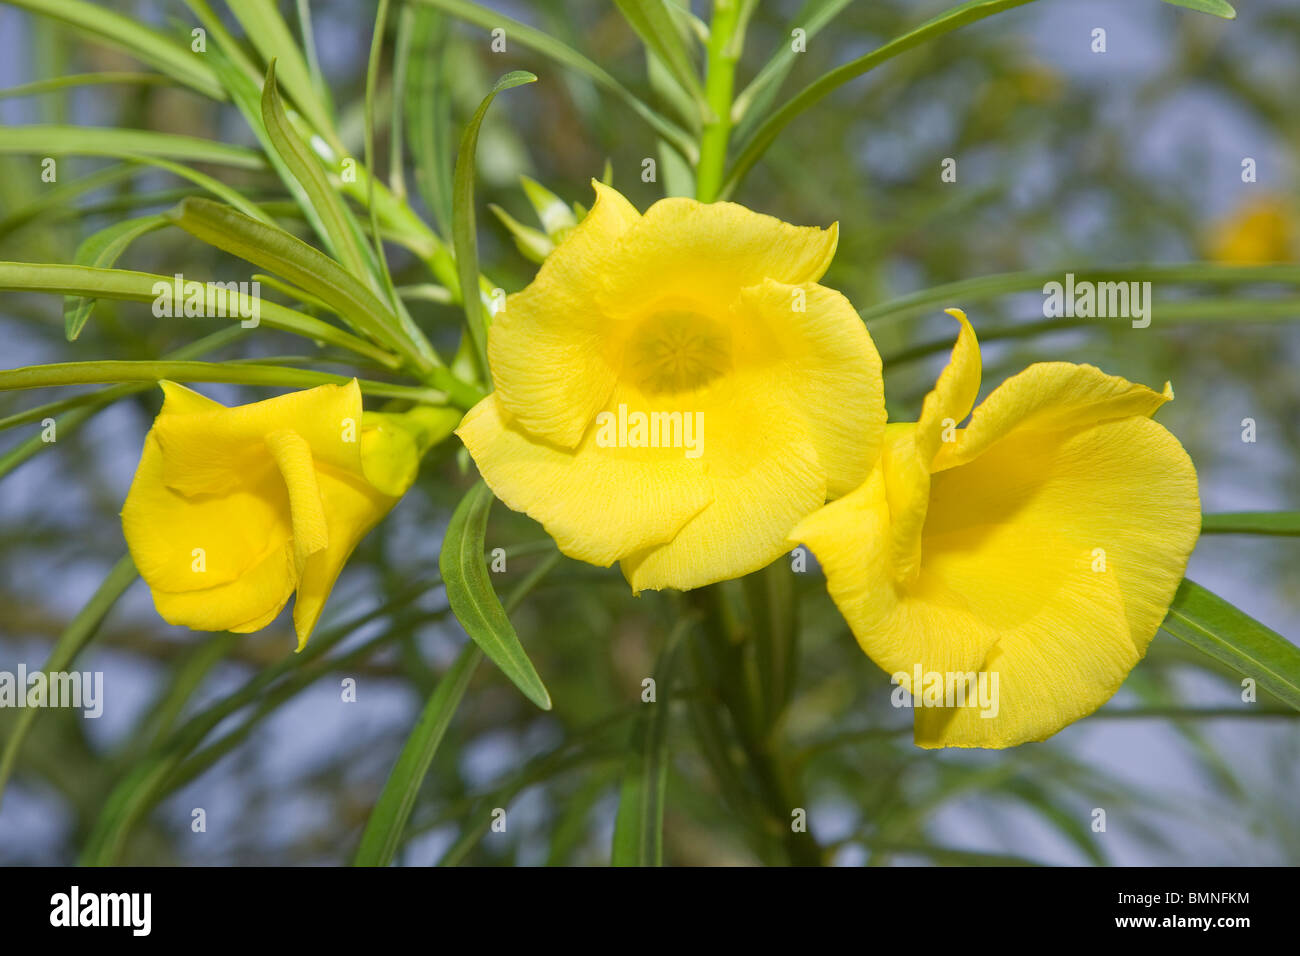 Yellow Oleander Flower Stock Photos Yellow Oleander Flower Stock